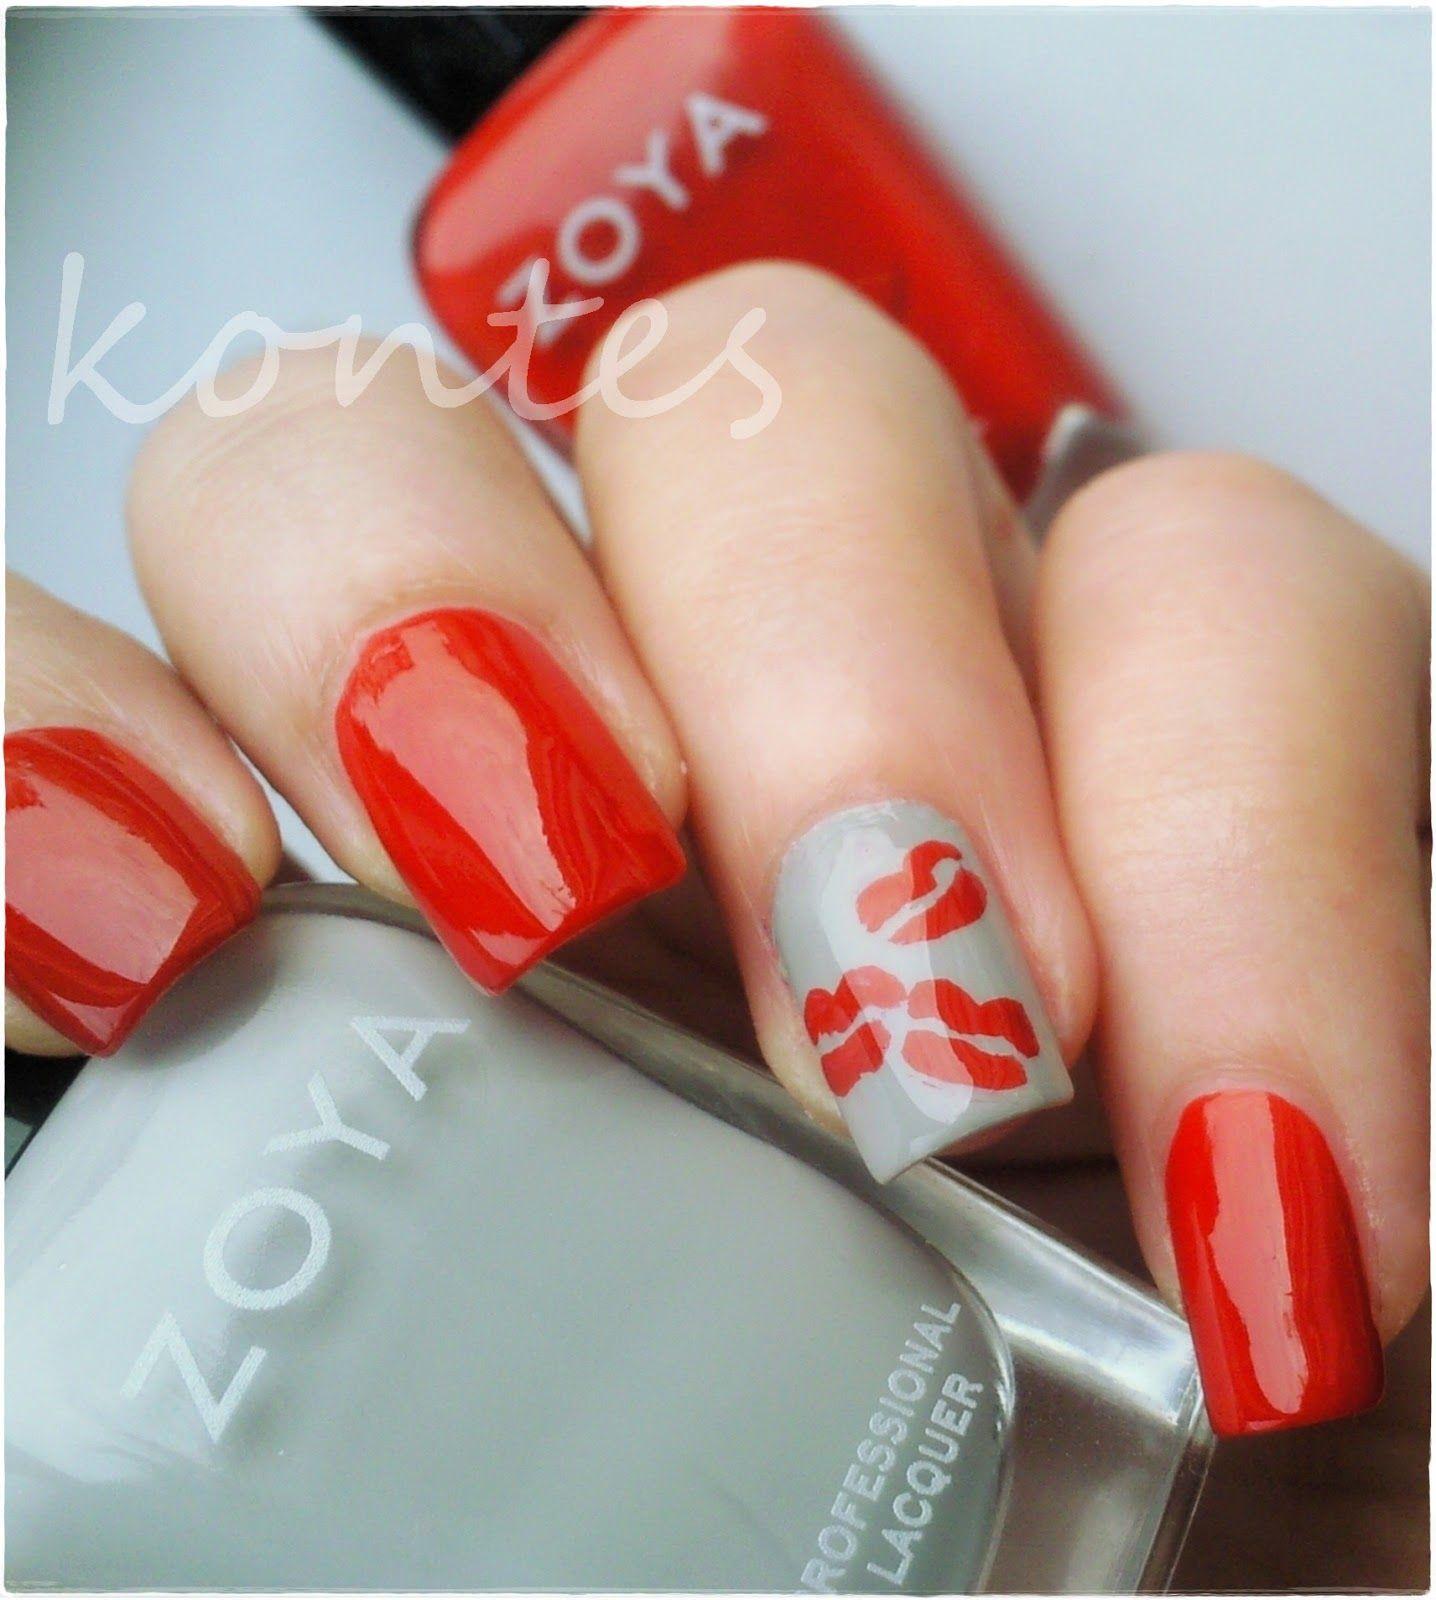 Kiss Nail Art featuring Zoya Nail Polish in Tamsen and Zoya Dove ...